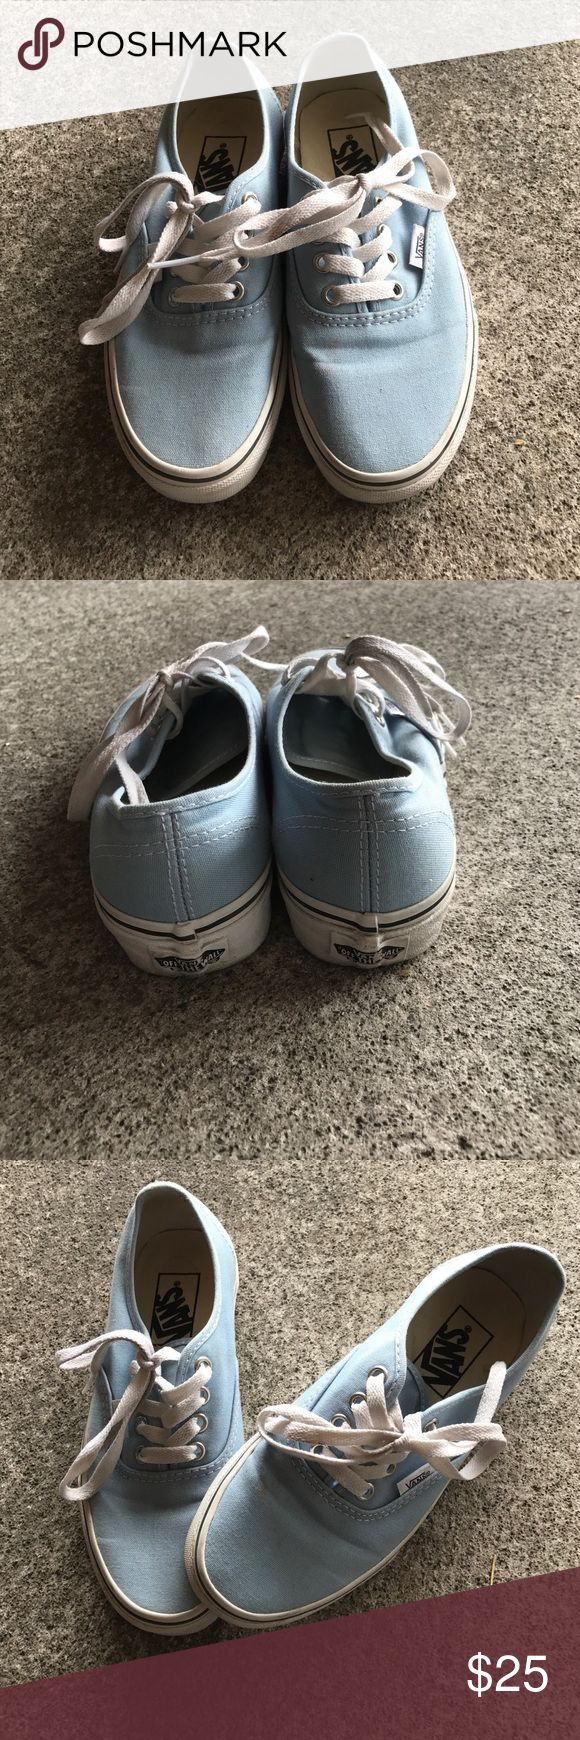 Light blue vans. Small pink stain on left shoe Light blue authentic classic vans. Little pink stain on the left shoe. Vans Shoes Sneakers